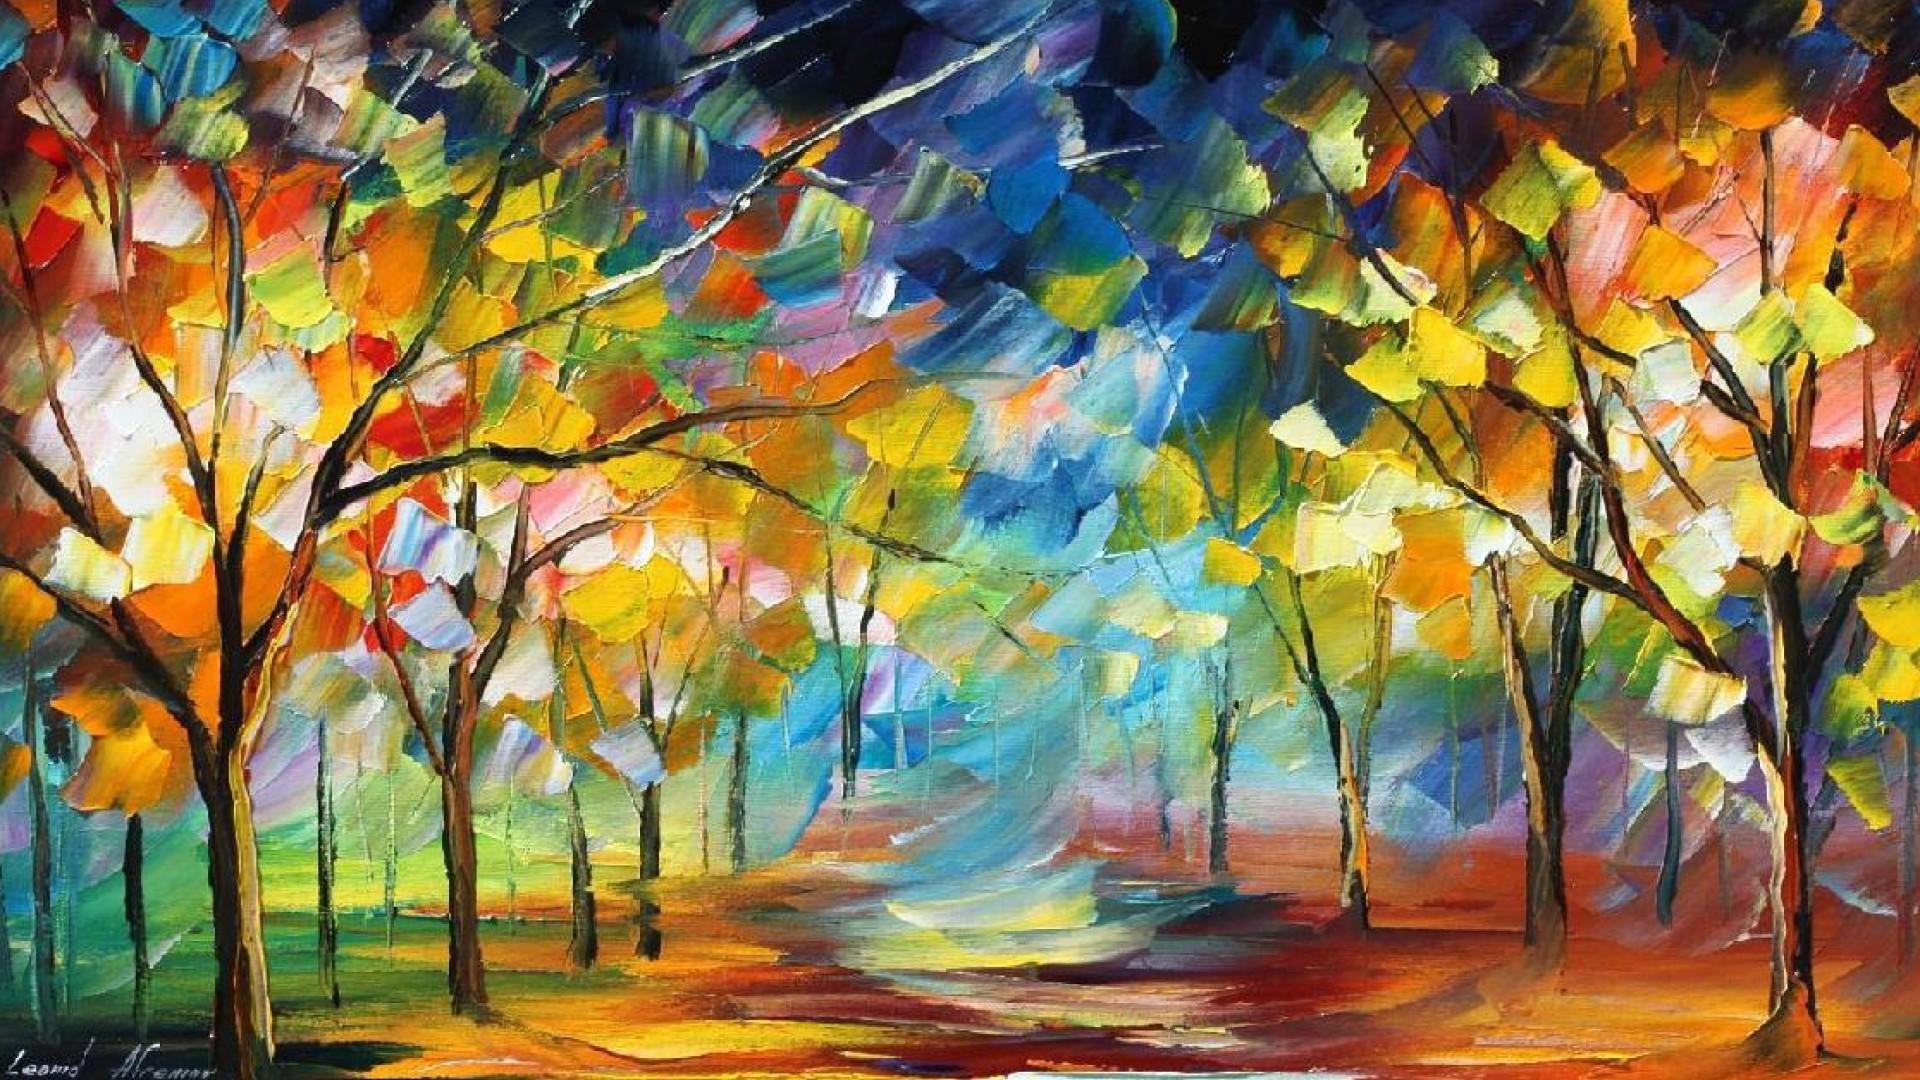 Wallpaper Lukisan Abstrak 1920x1080 Gorwozo 1139206